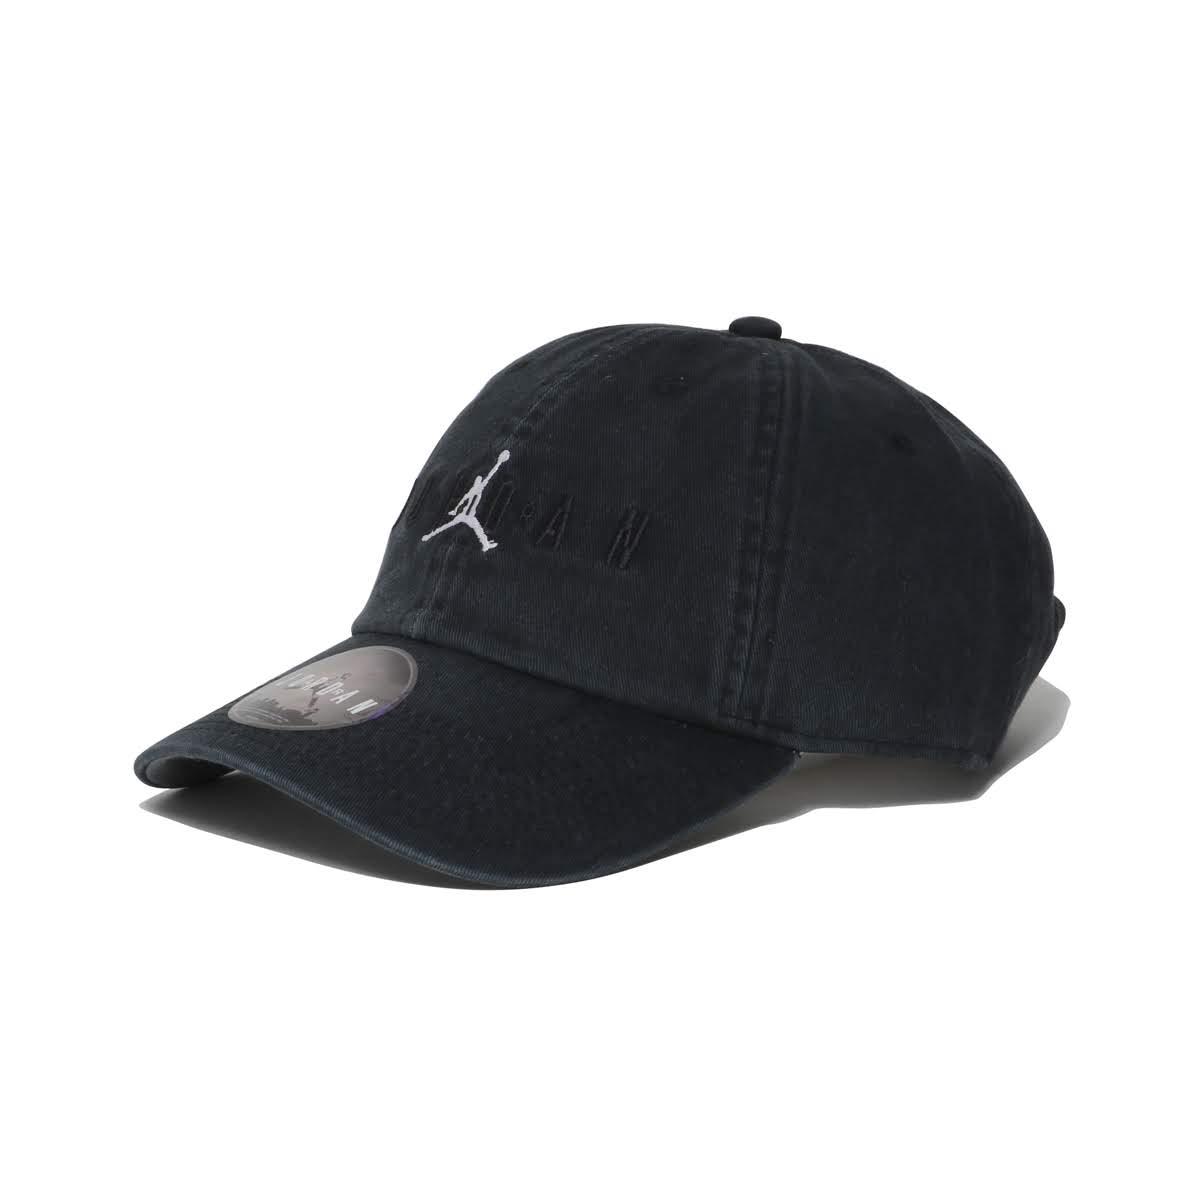 93ae0744328 atmos pink: NIKE JORDAN H86 AIR CAP (Nike Jordan H86 air cap) BLACK ...